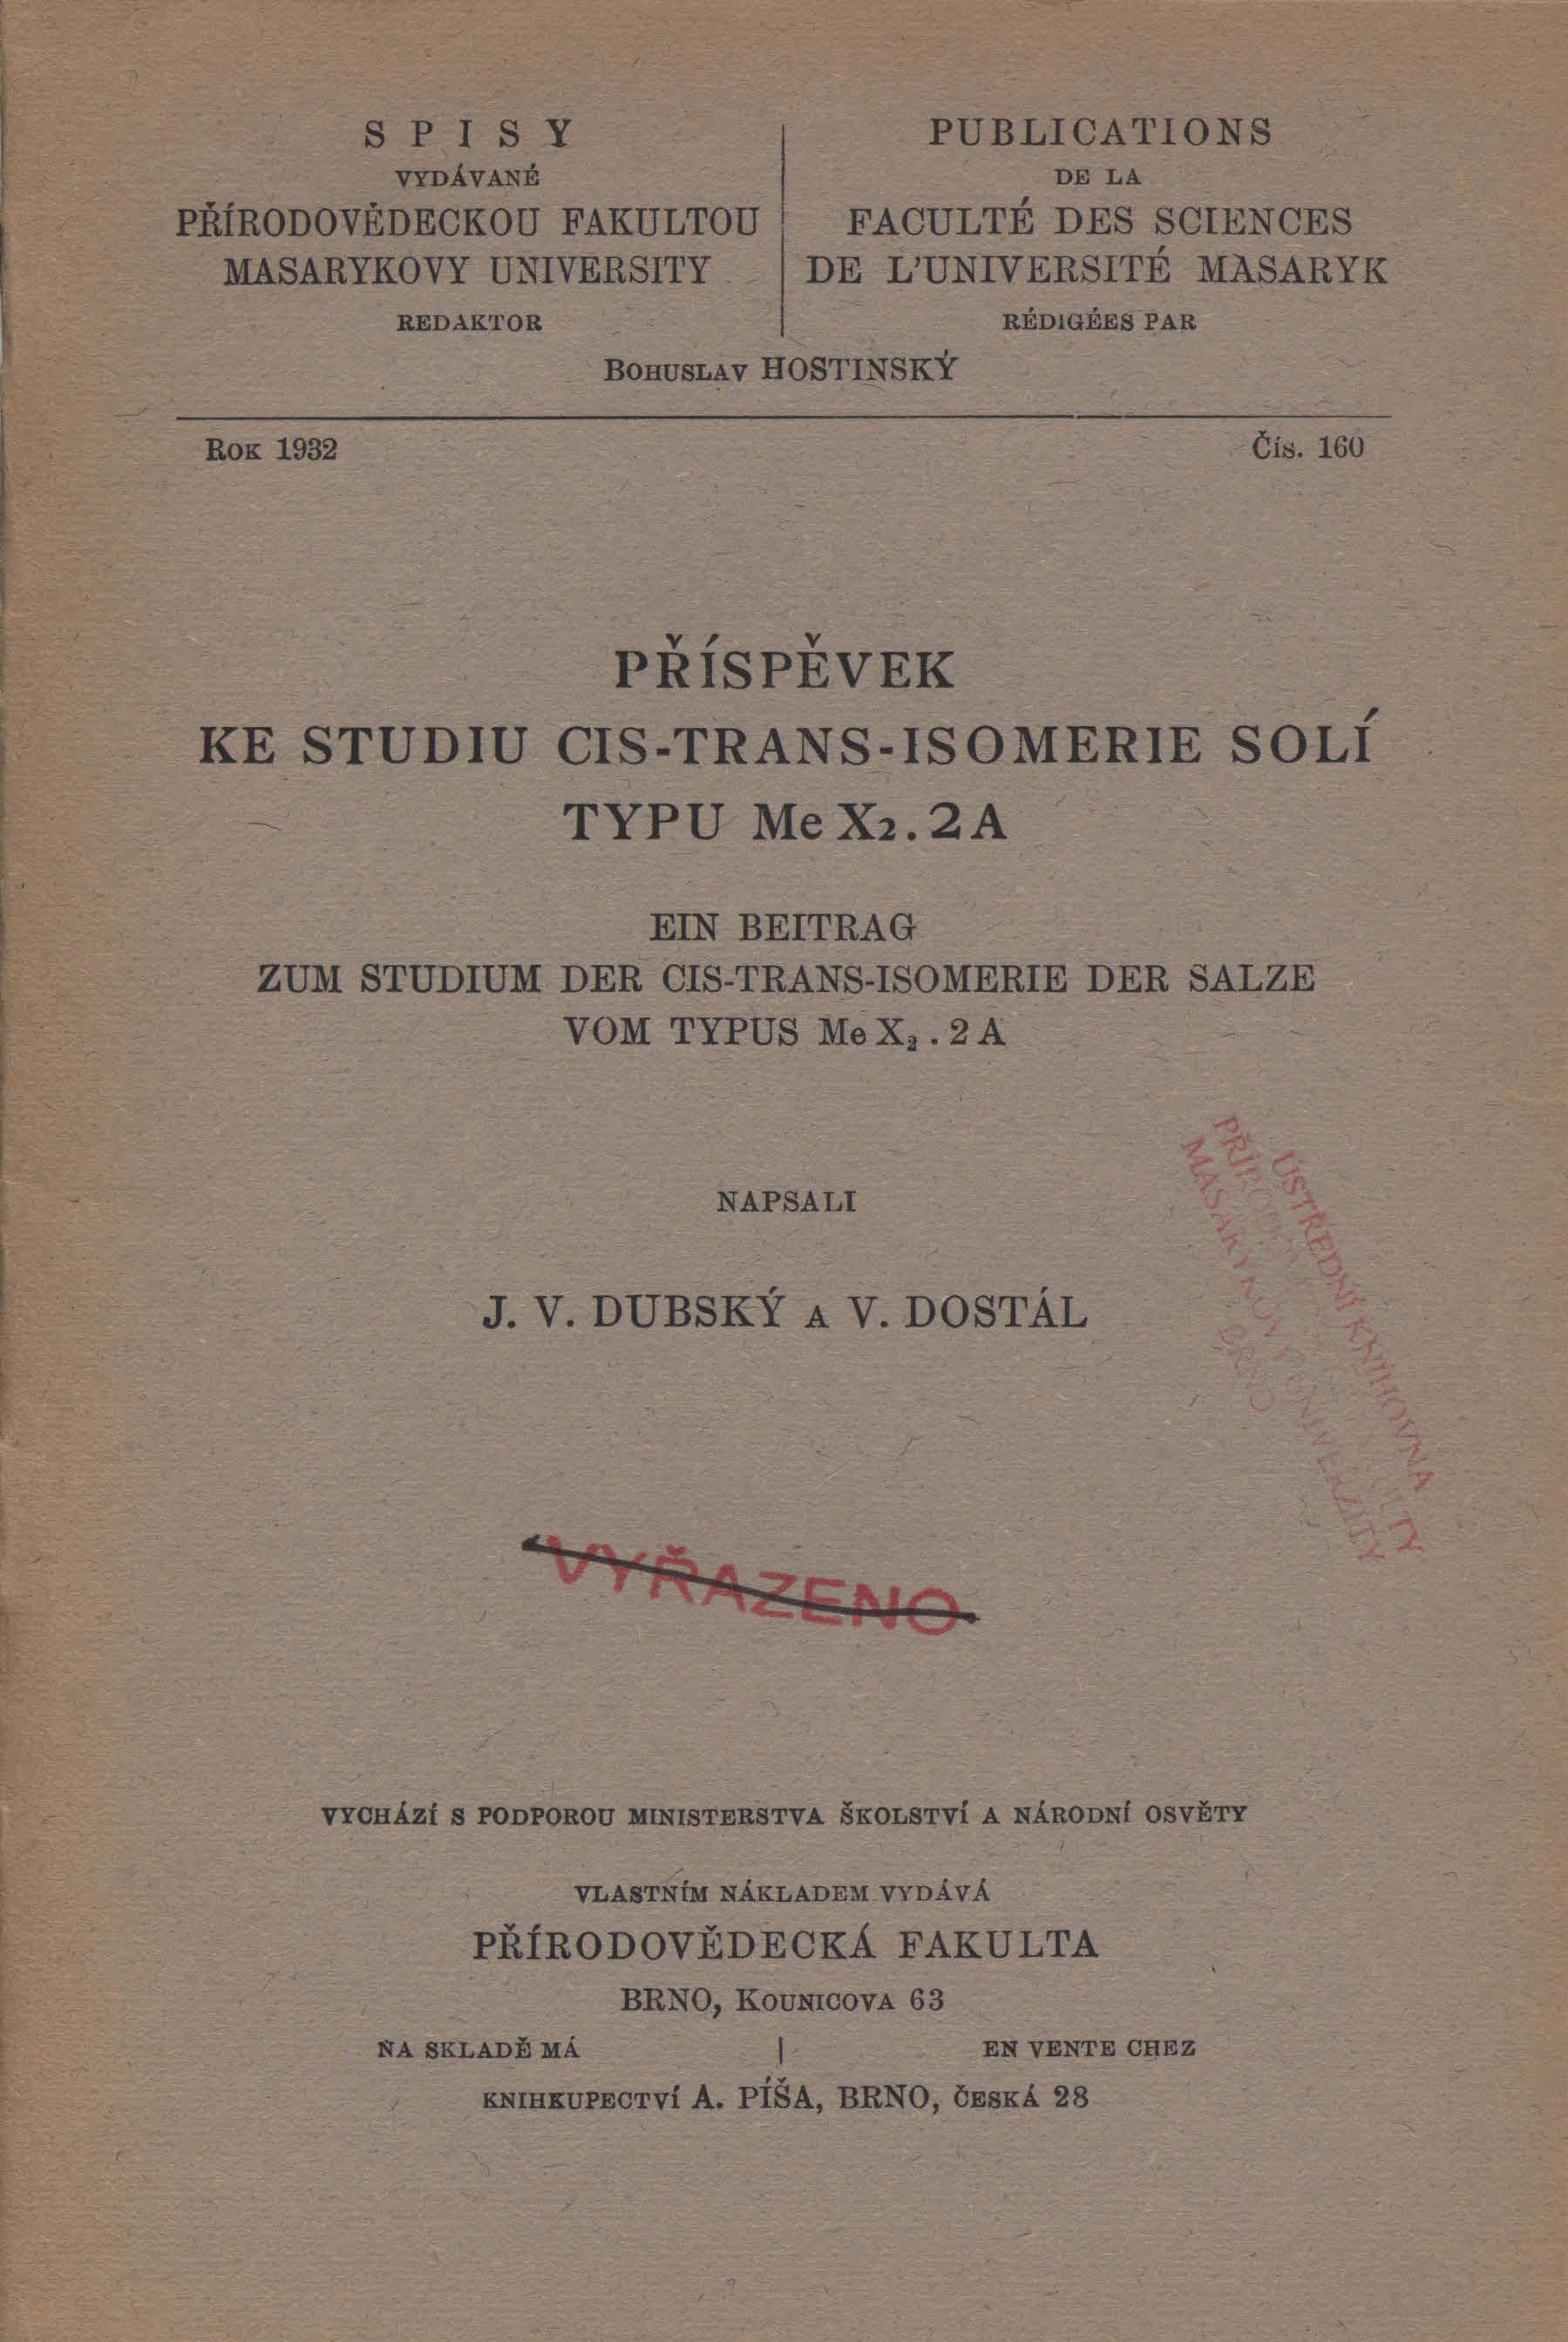 Obálka pro Příspěvek ke studiu cis-trans-isomeric solí typu Me X2.2A